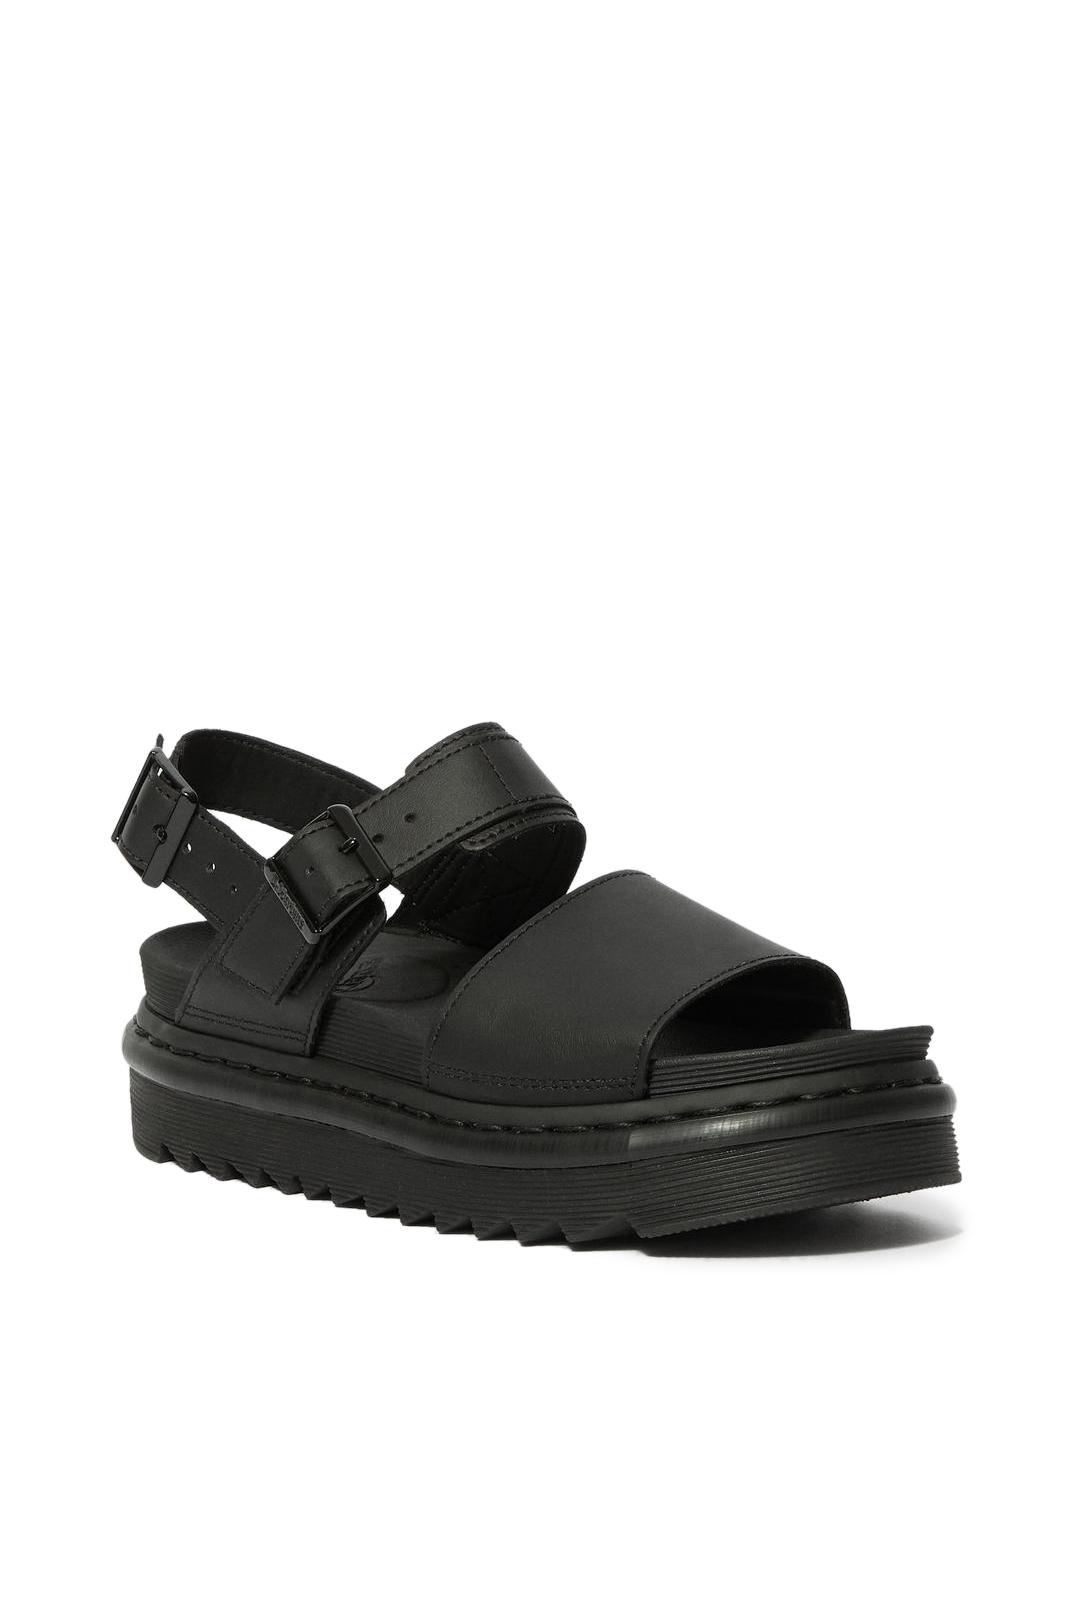 Voss Sandals Black